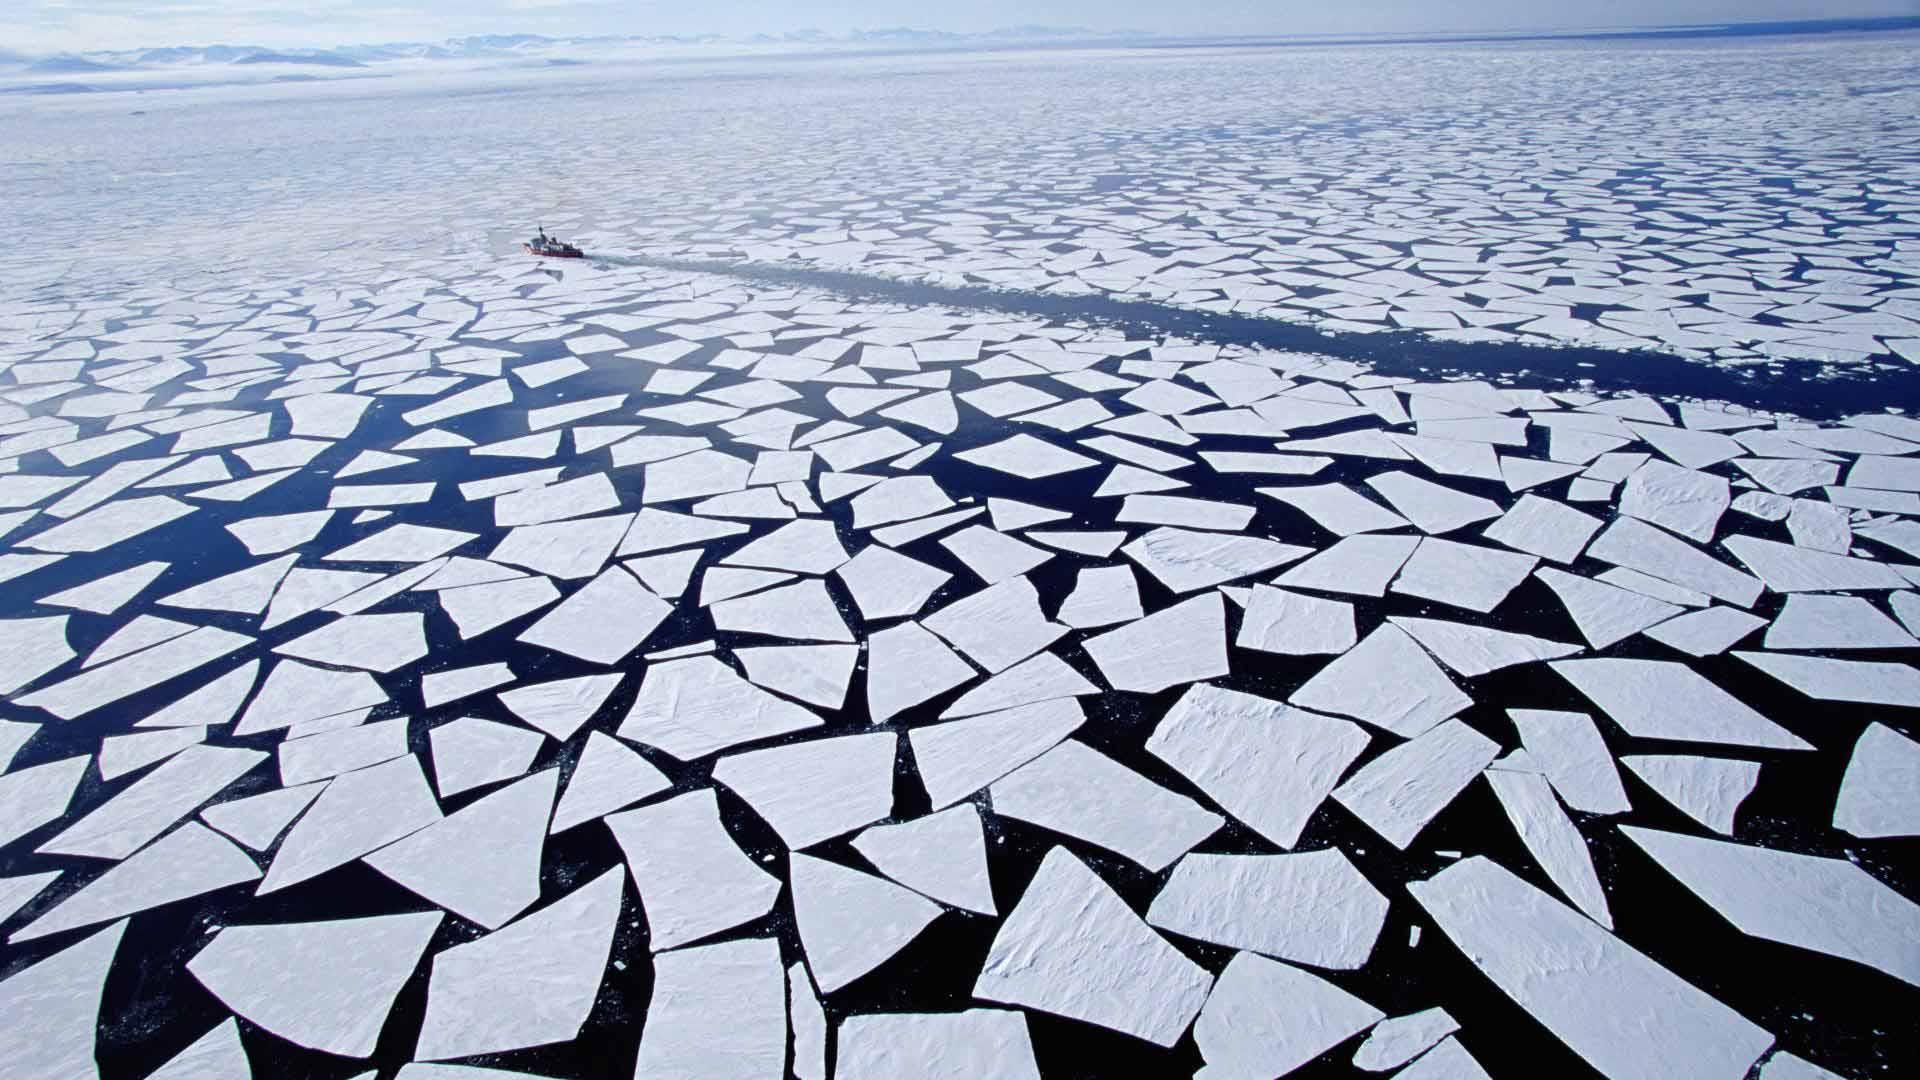 Atka Bay, Weddell Sea, Antarctica